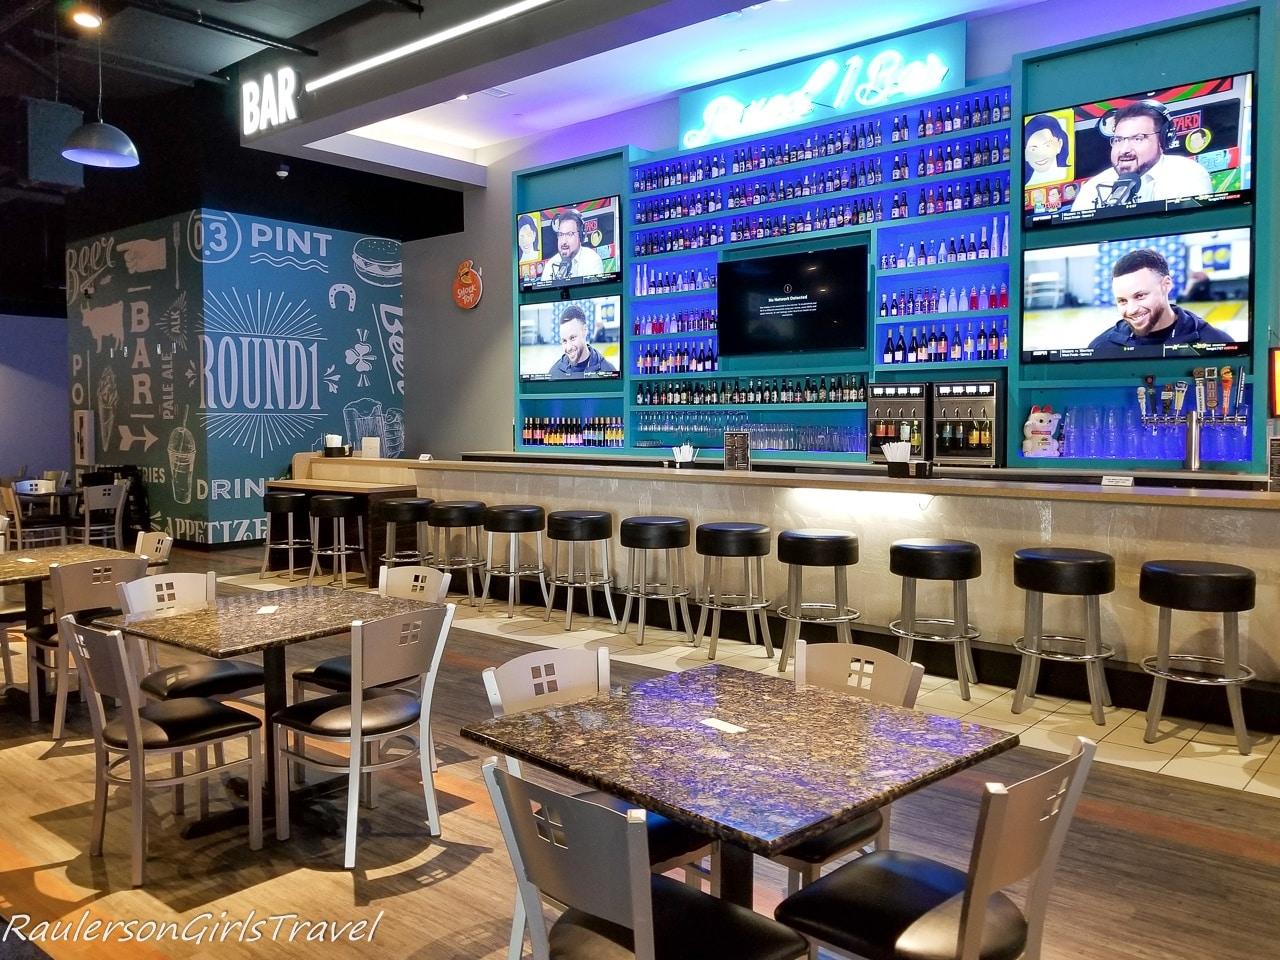 The bar at Round 1